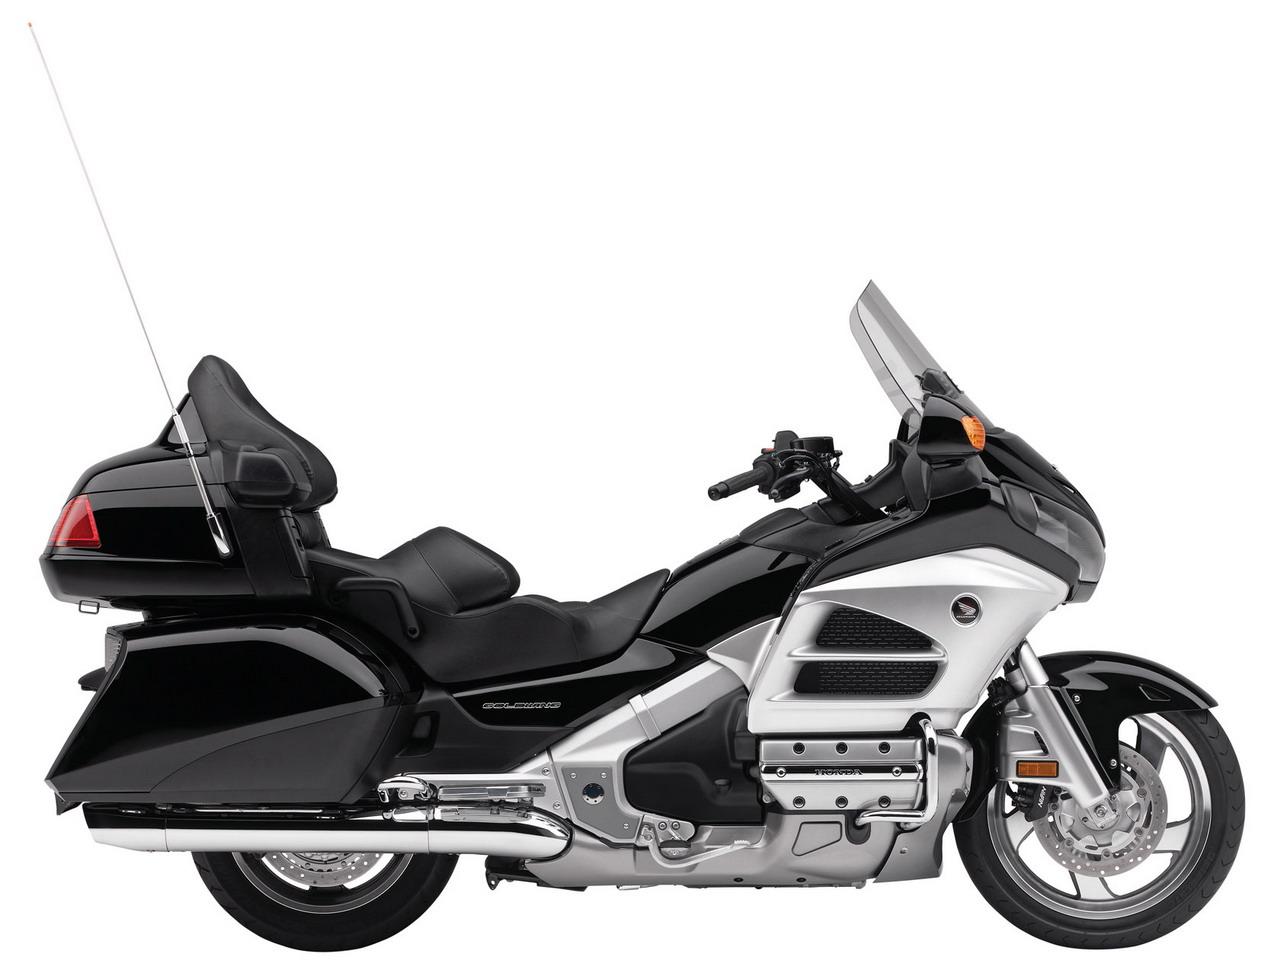 2012 honda gold wing gl1800 airbag new motorcycle. Black Bedroom Furniture Sets. Home Design Ideas